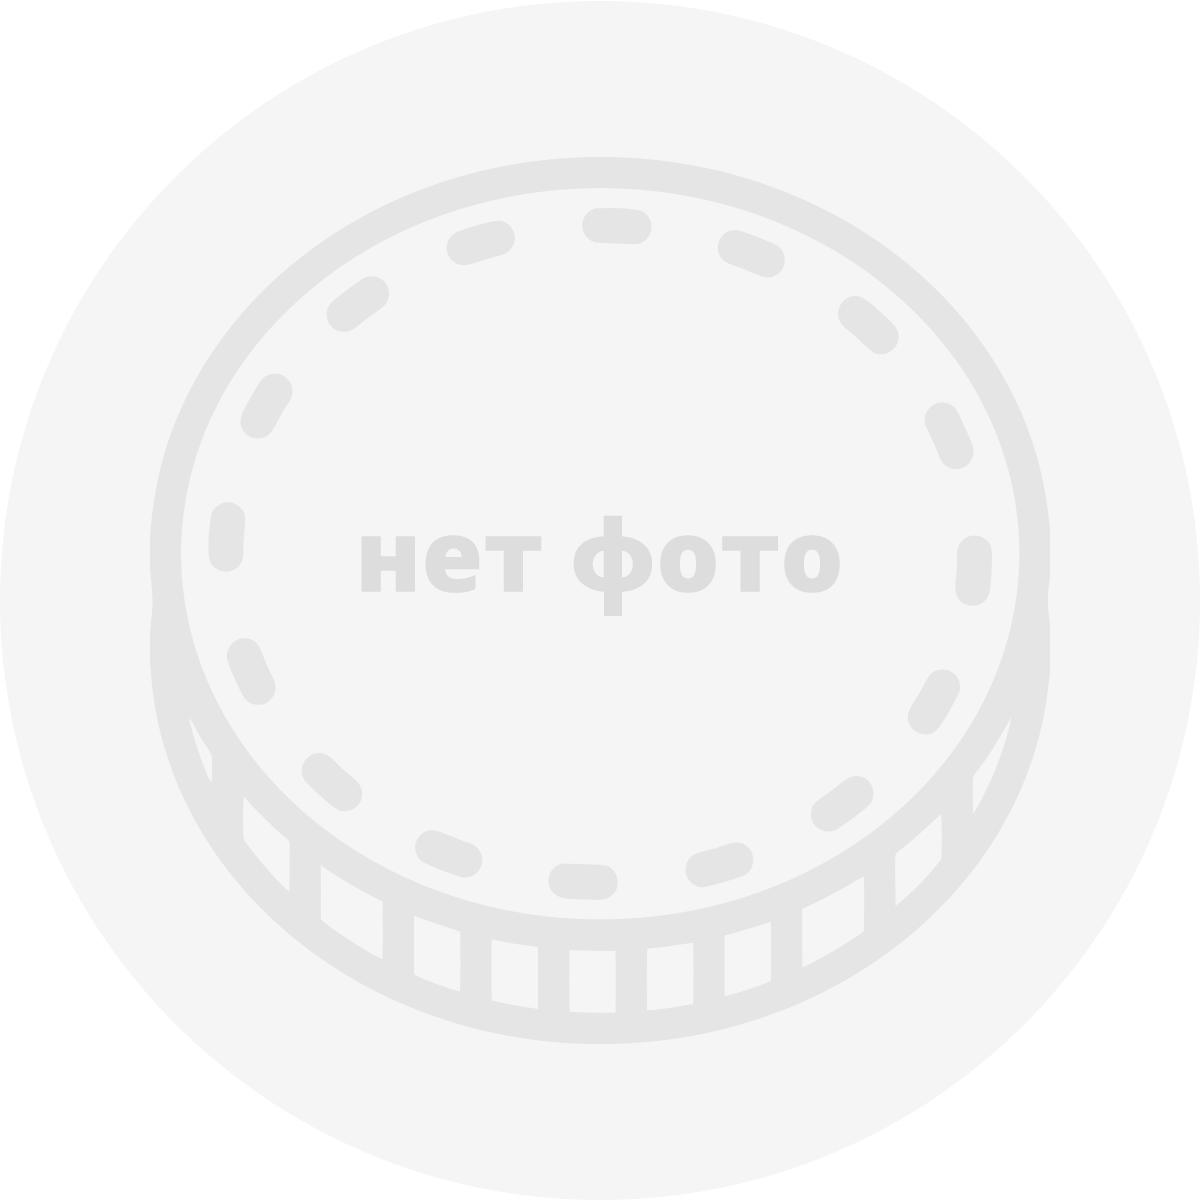 Стрейтс-Сетлментс, 1 цент (1919–1920 г.)